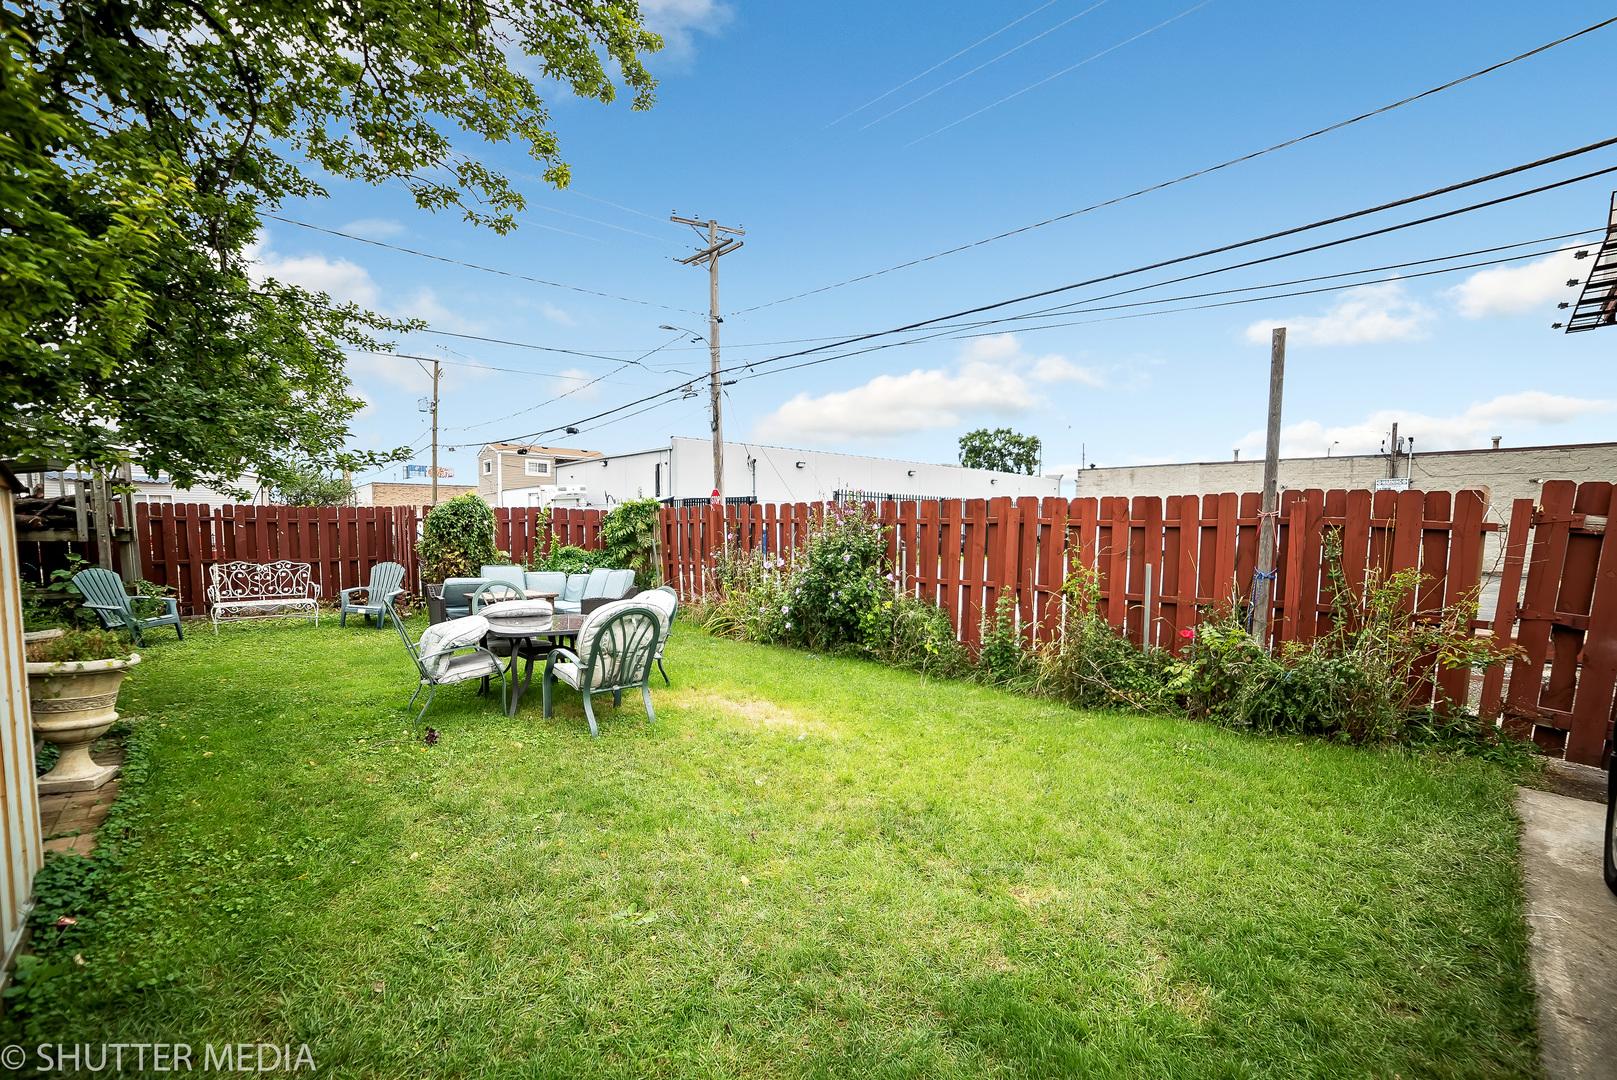 1828 North 34th, Stone Park, Illinois, 60165